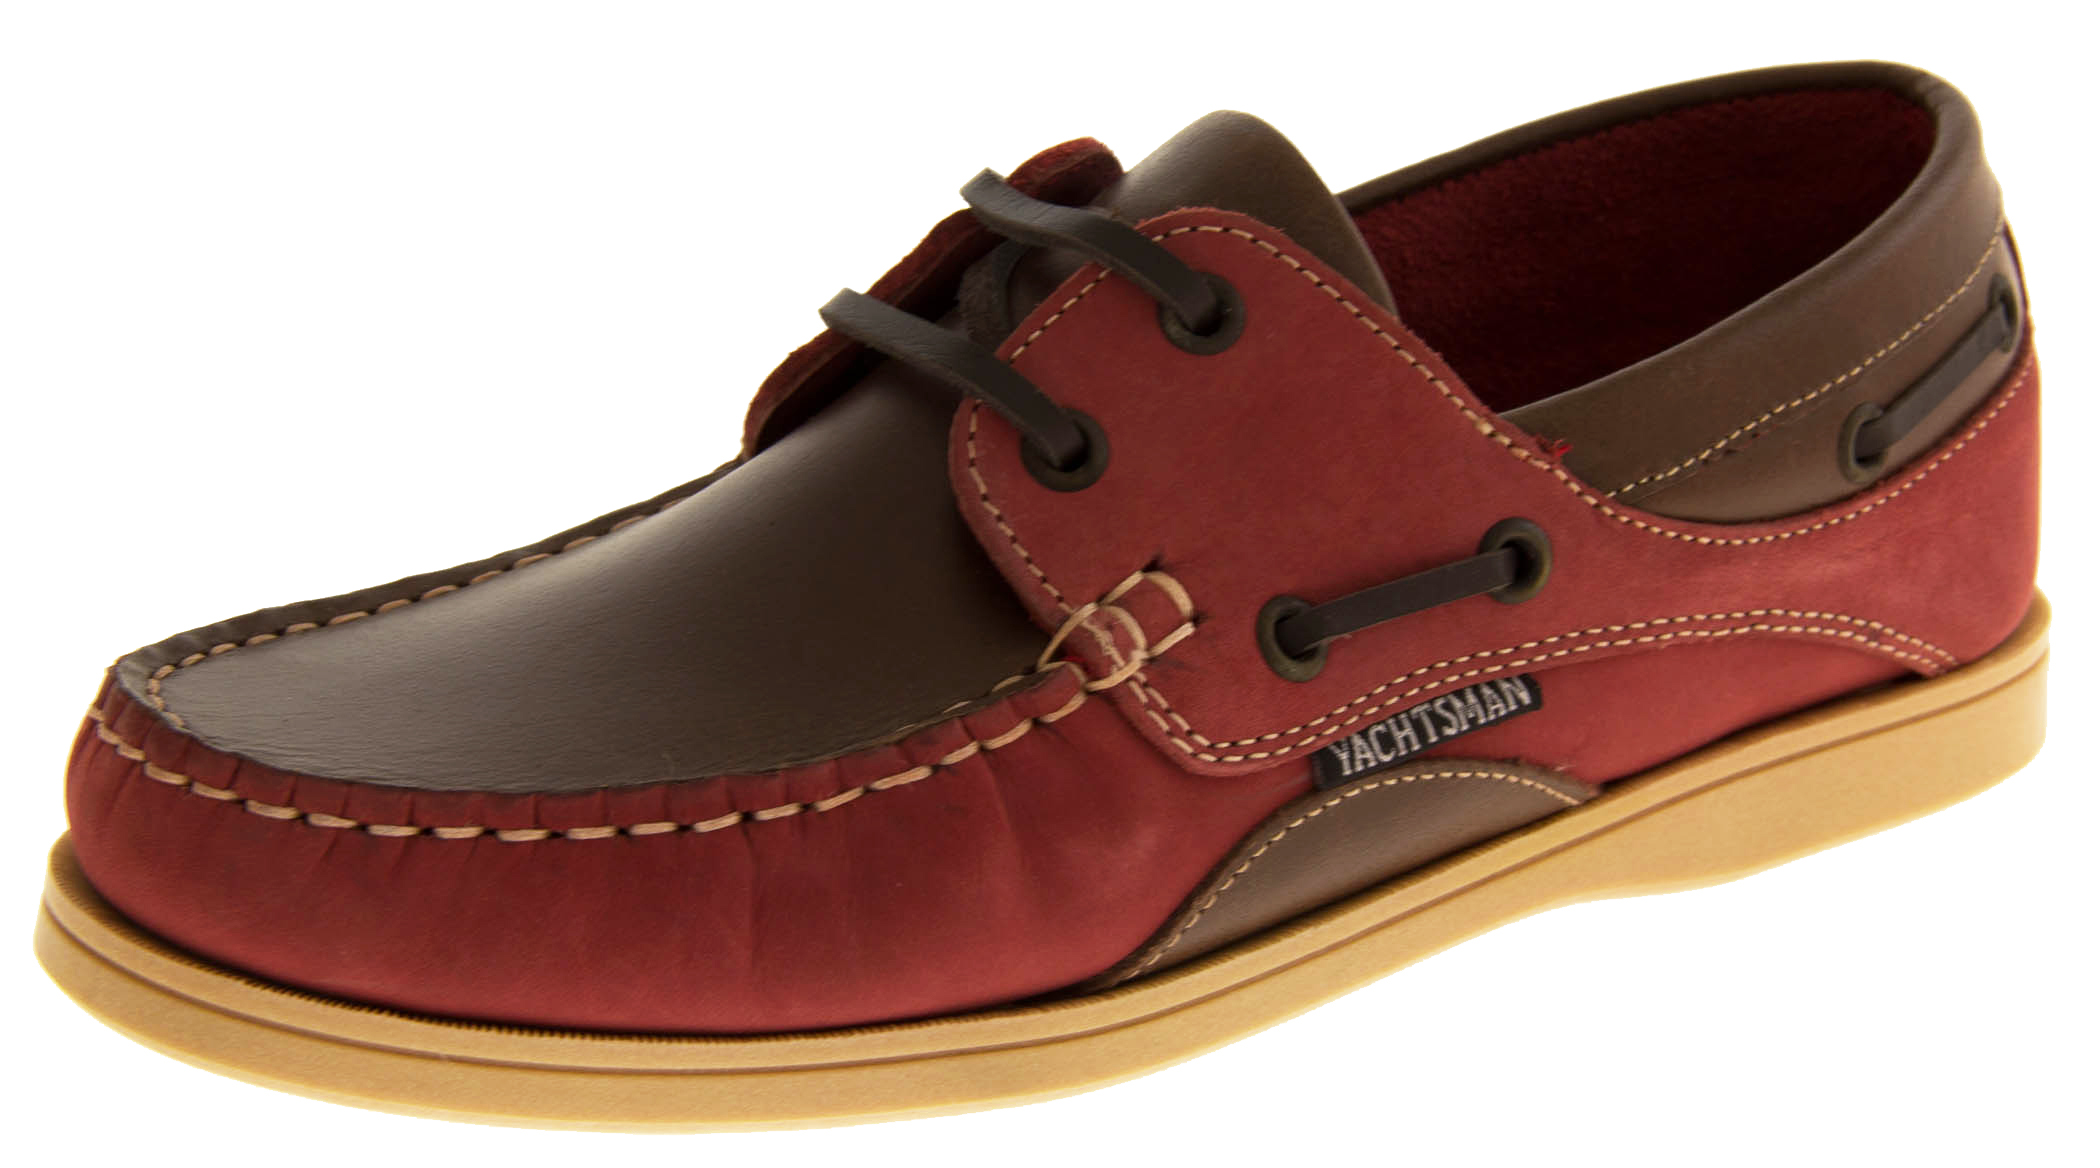 Yachtsman Boat Shoes Reviews